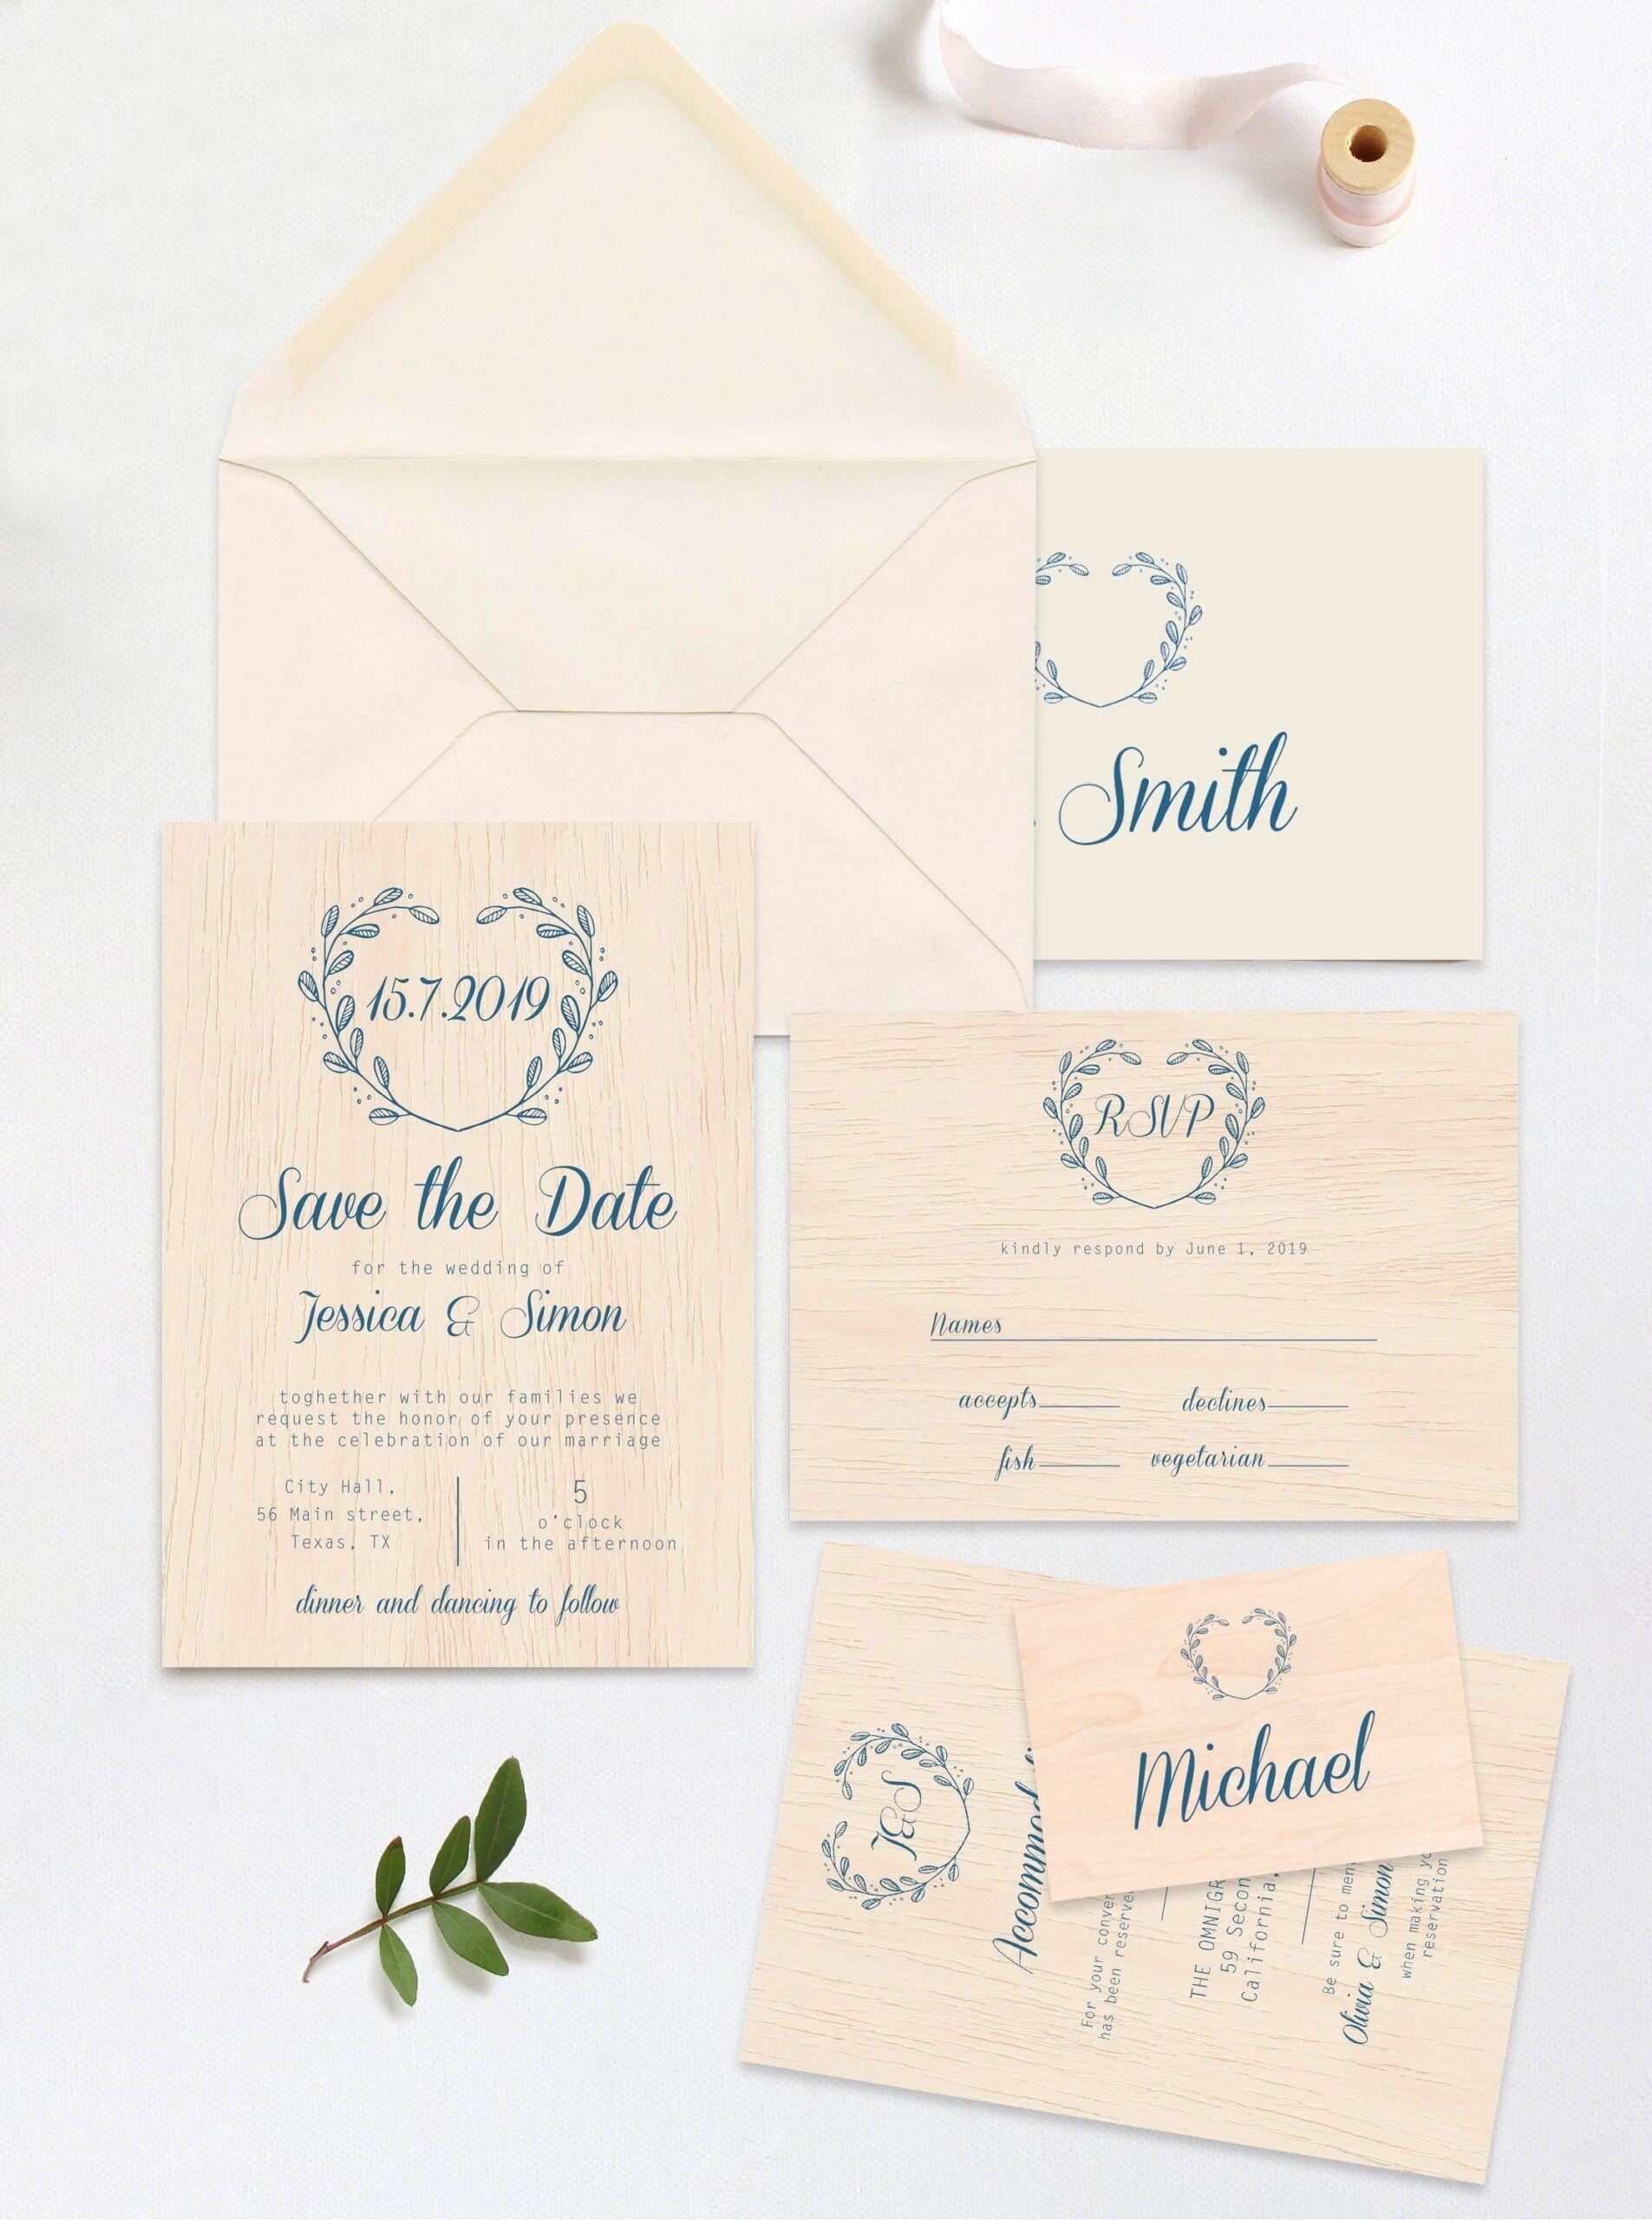 Invitation Card Format Size Wedding Invitation Size Wedding Invitations Rsvp Cards Invitation Card Format